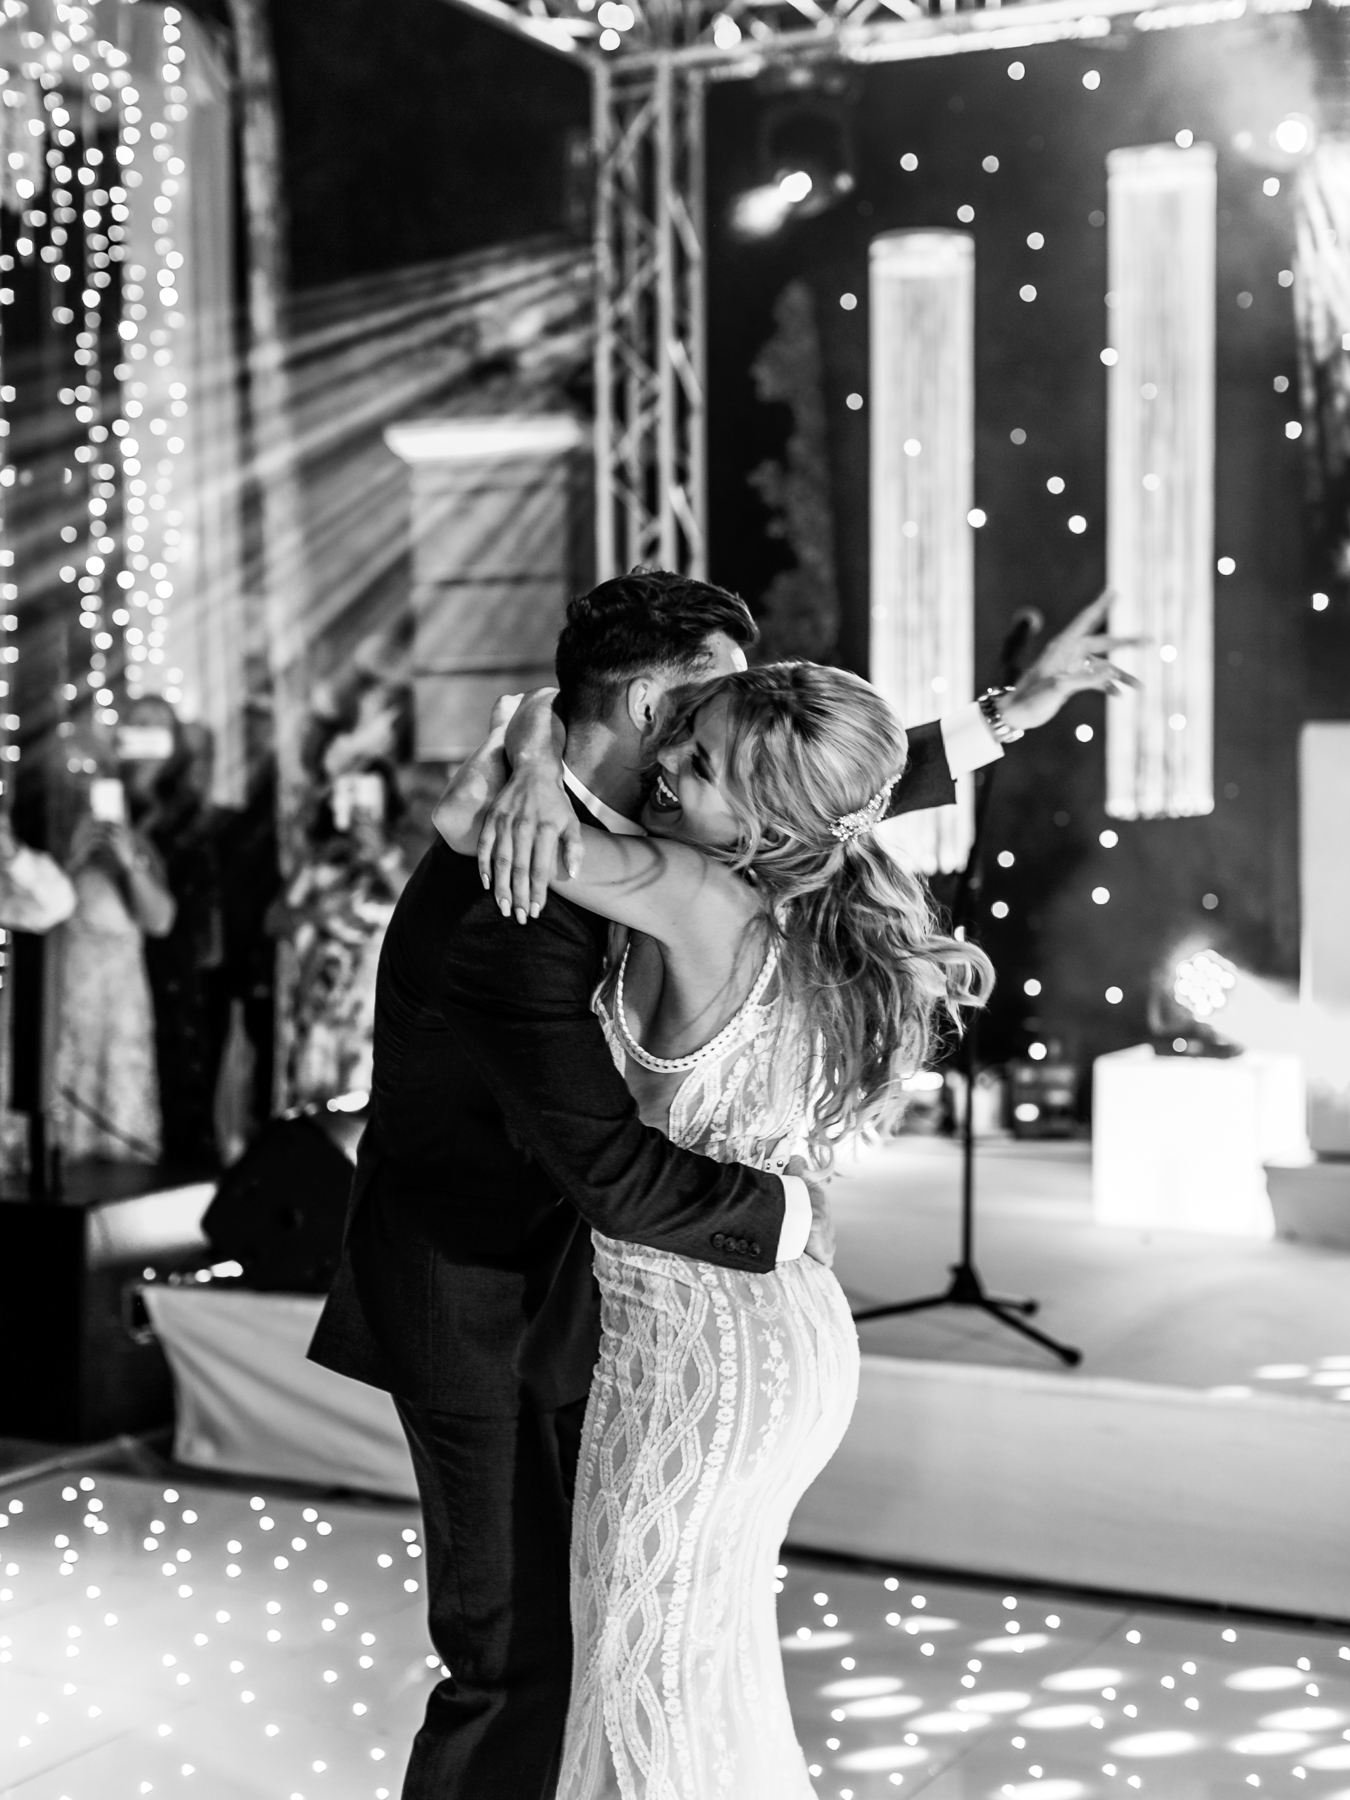 Wedding in Villa Padierna Palace Hotel Marbella Spain